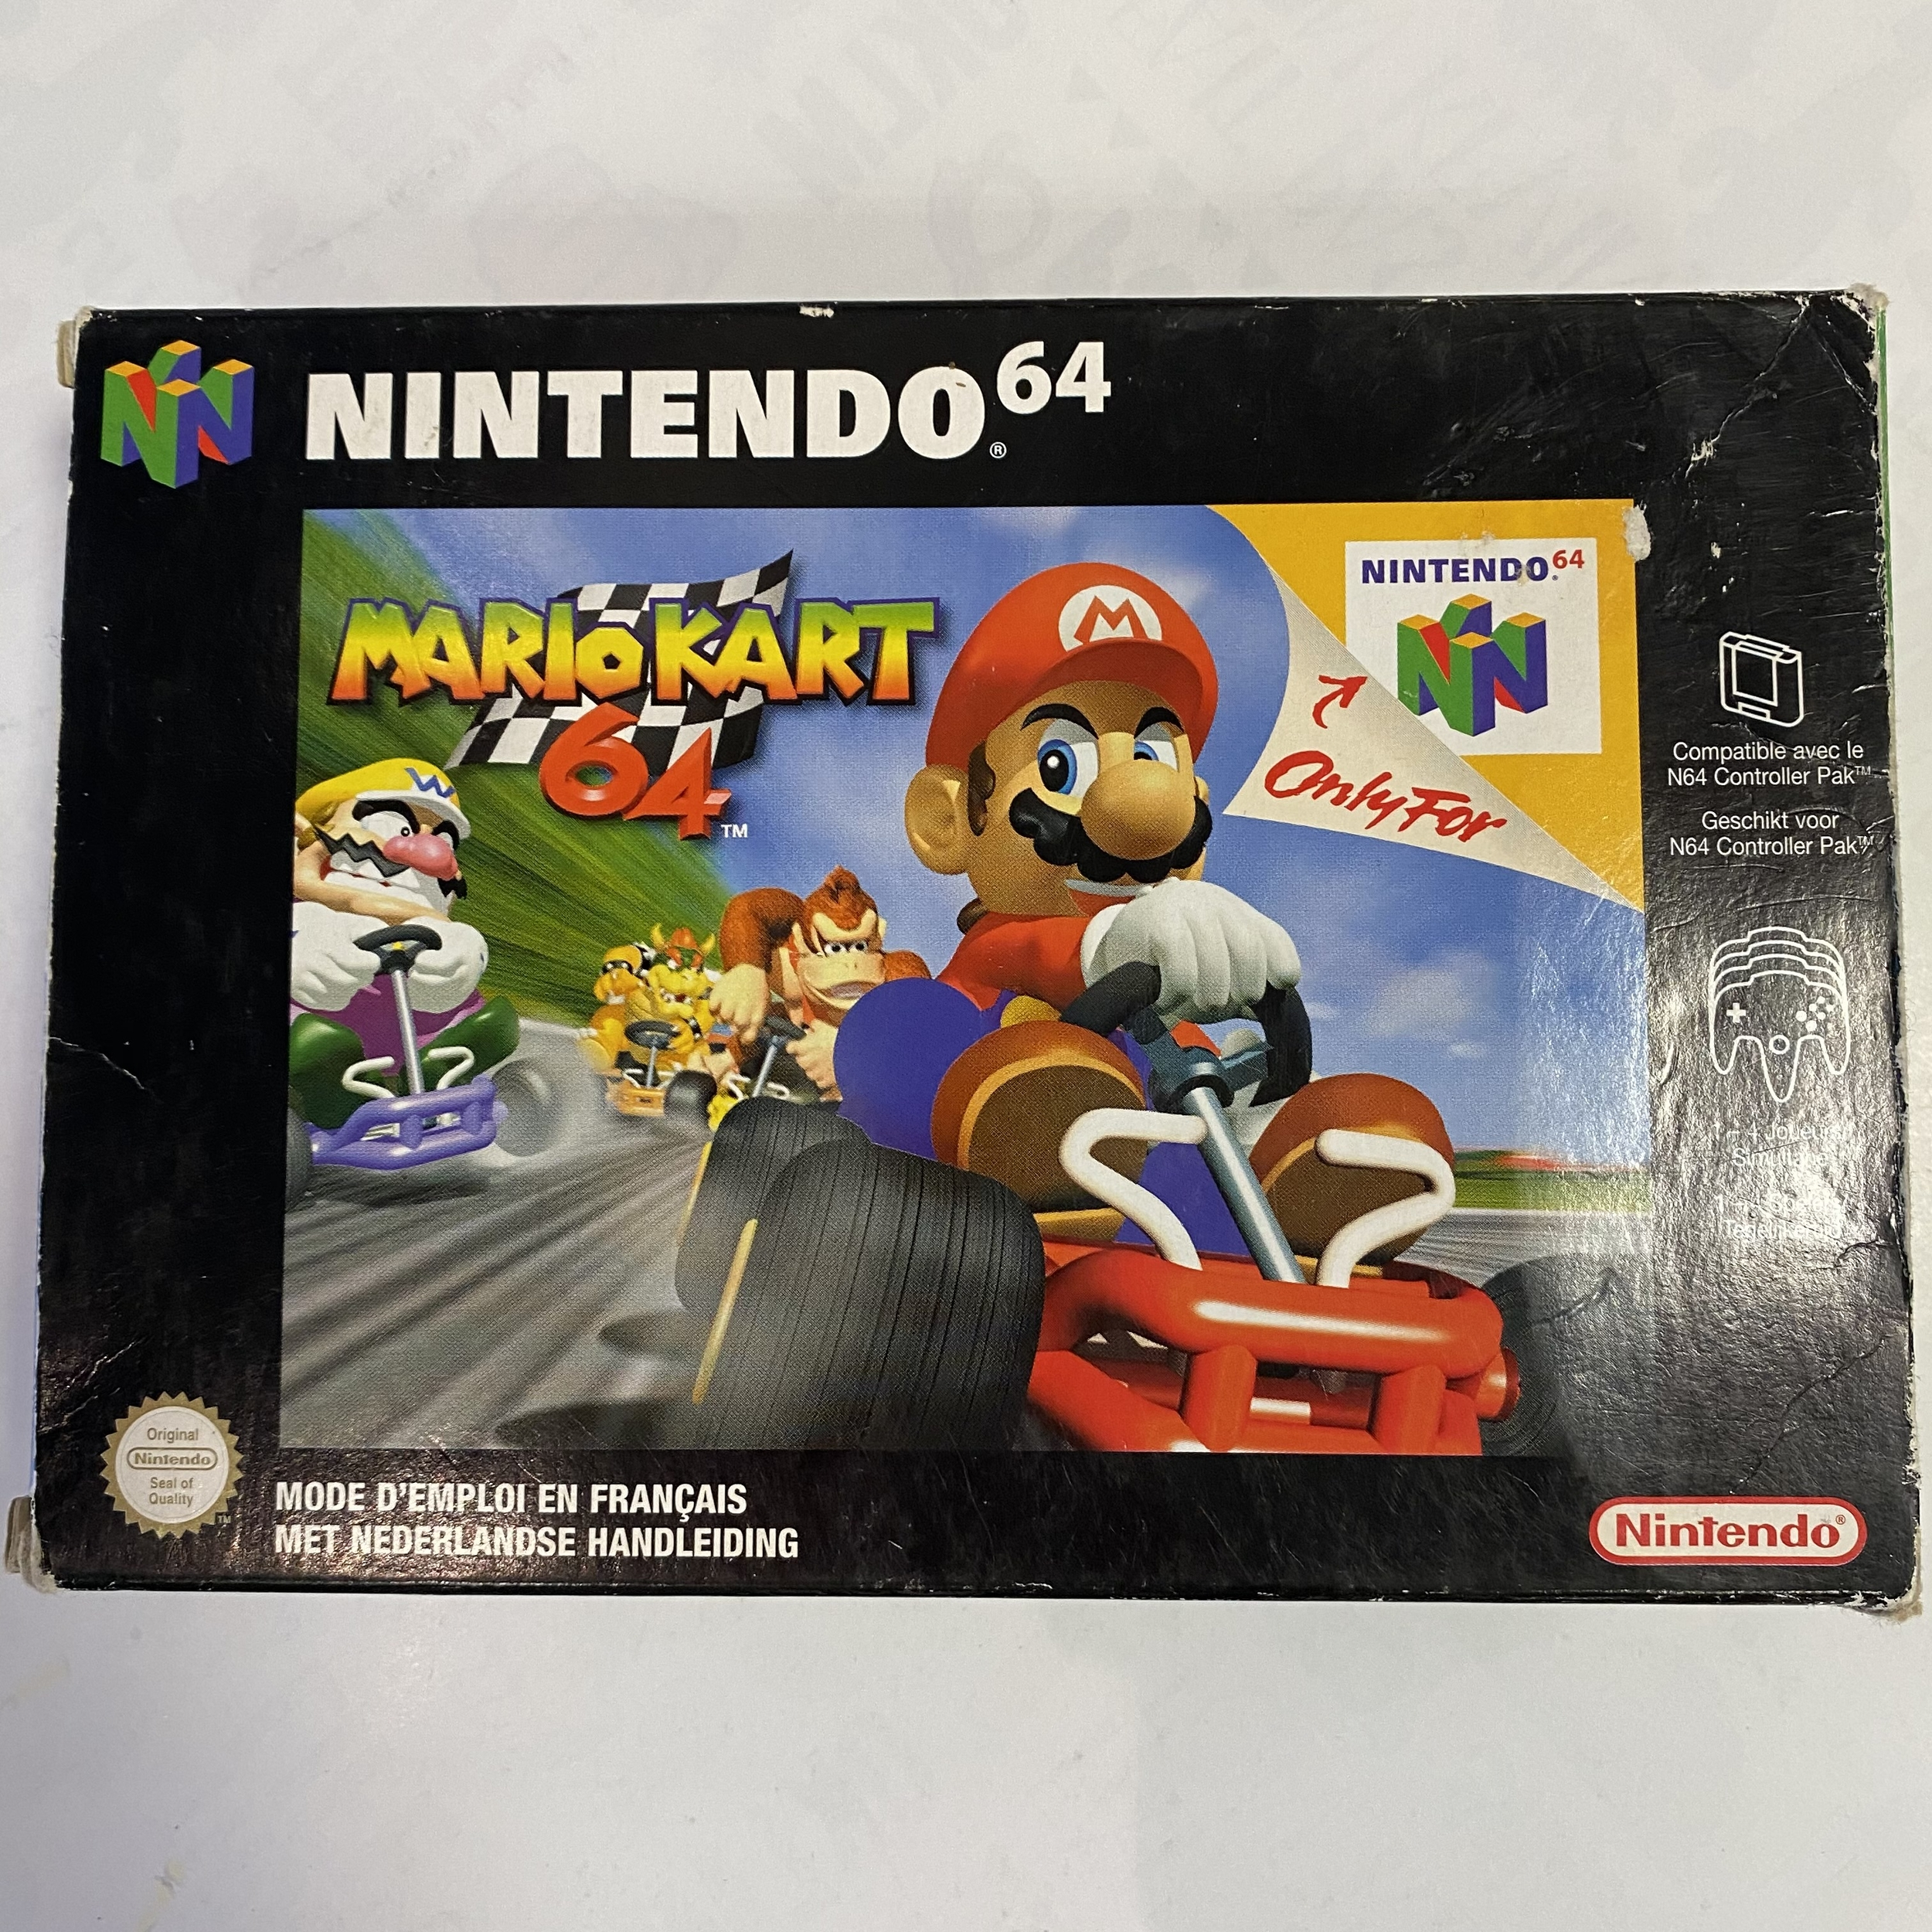 Nintendo 64 - Mario Kart 64 occasion